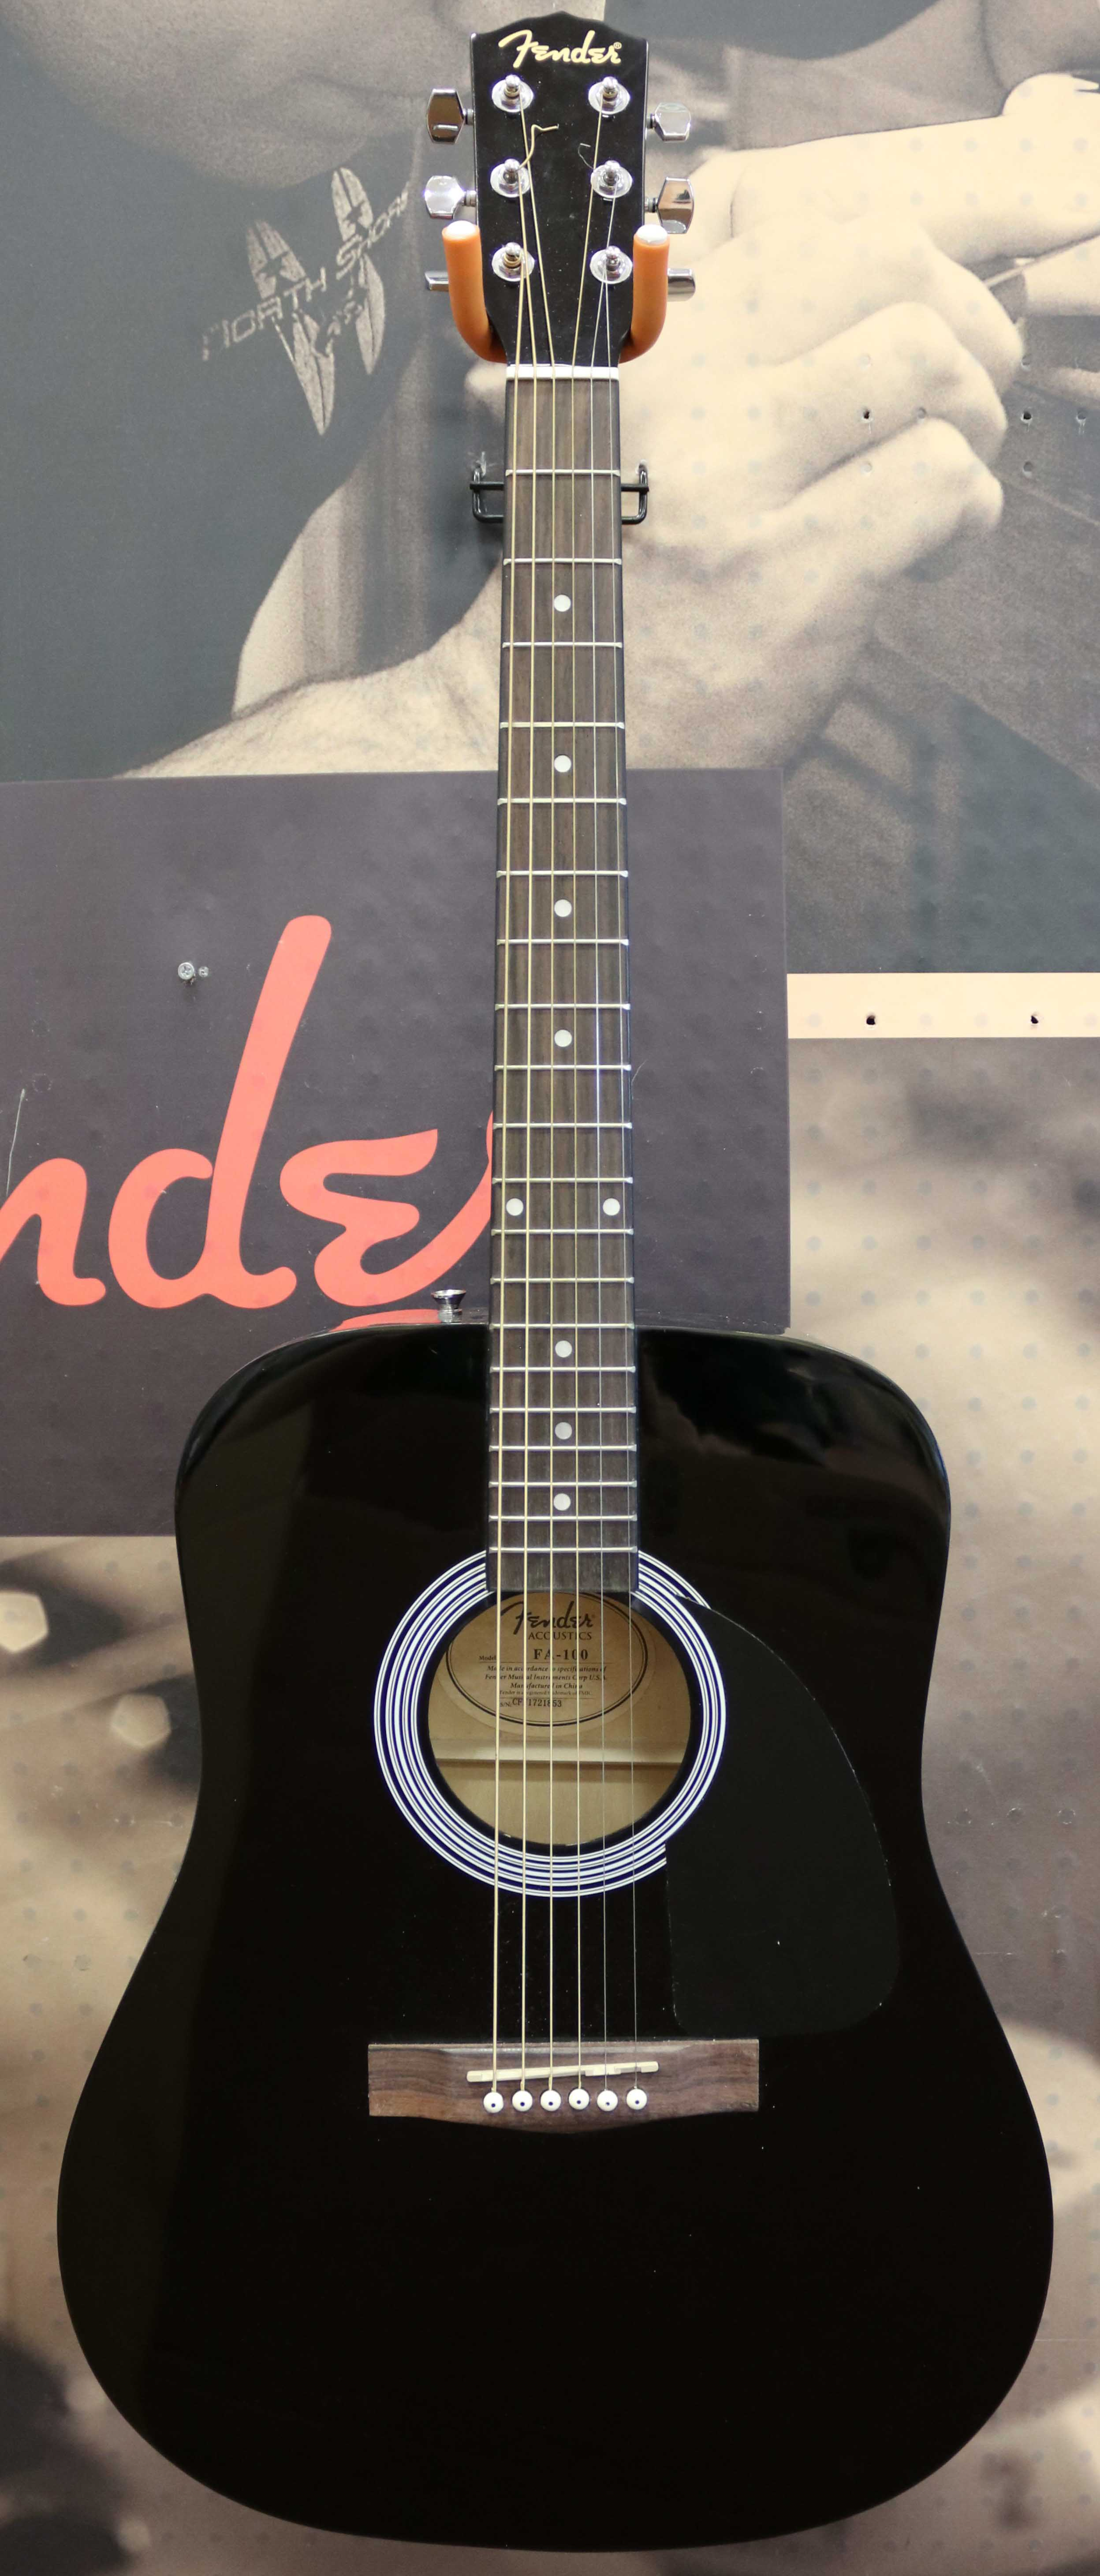 9a7c3262c2 Fender Fa-100 Dreadnought Acoustic Guitar - Black for sale online | eBay